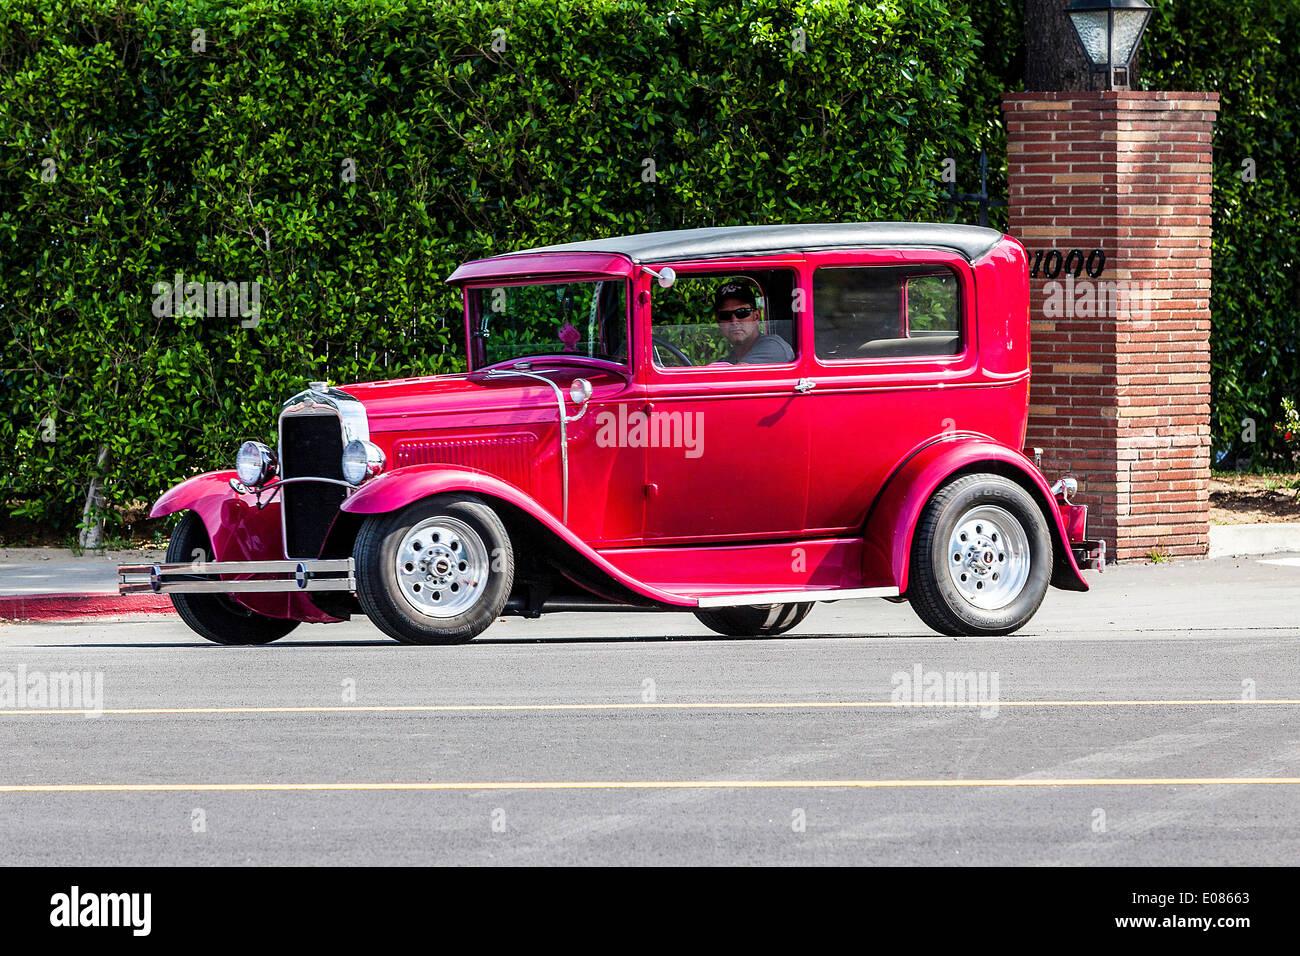 Ein 30er Ford Sedan Hotrod Stockfoto, Bild: 69021963 - Alamy